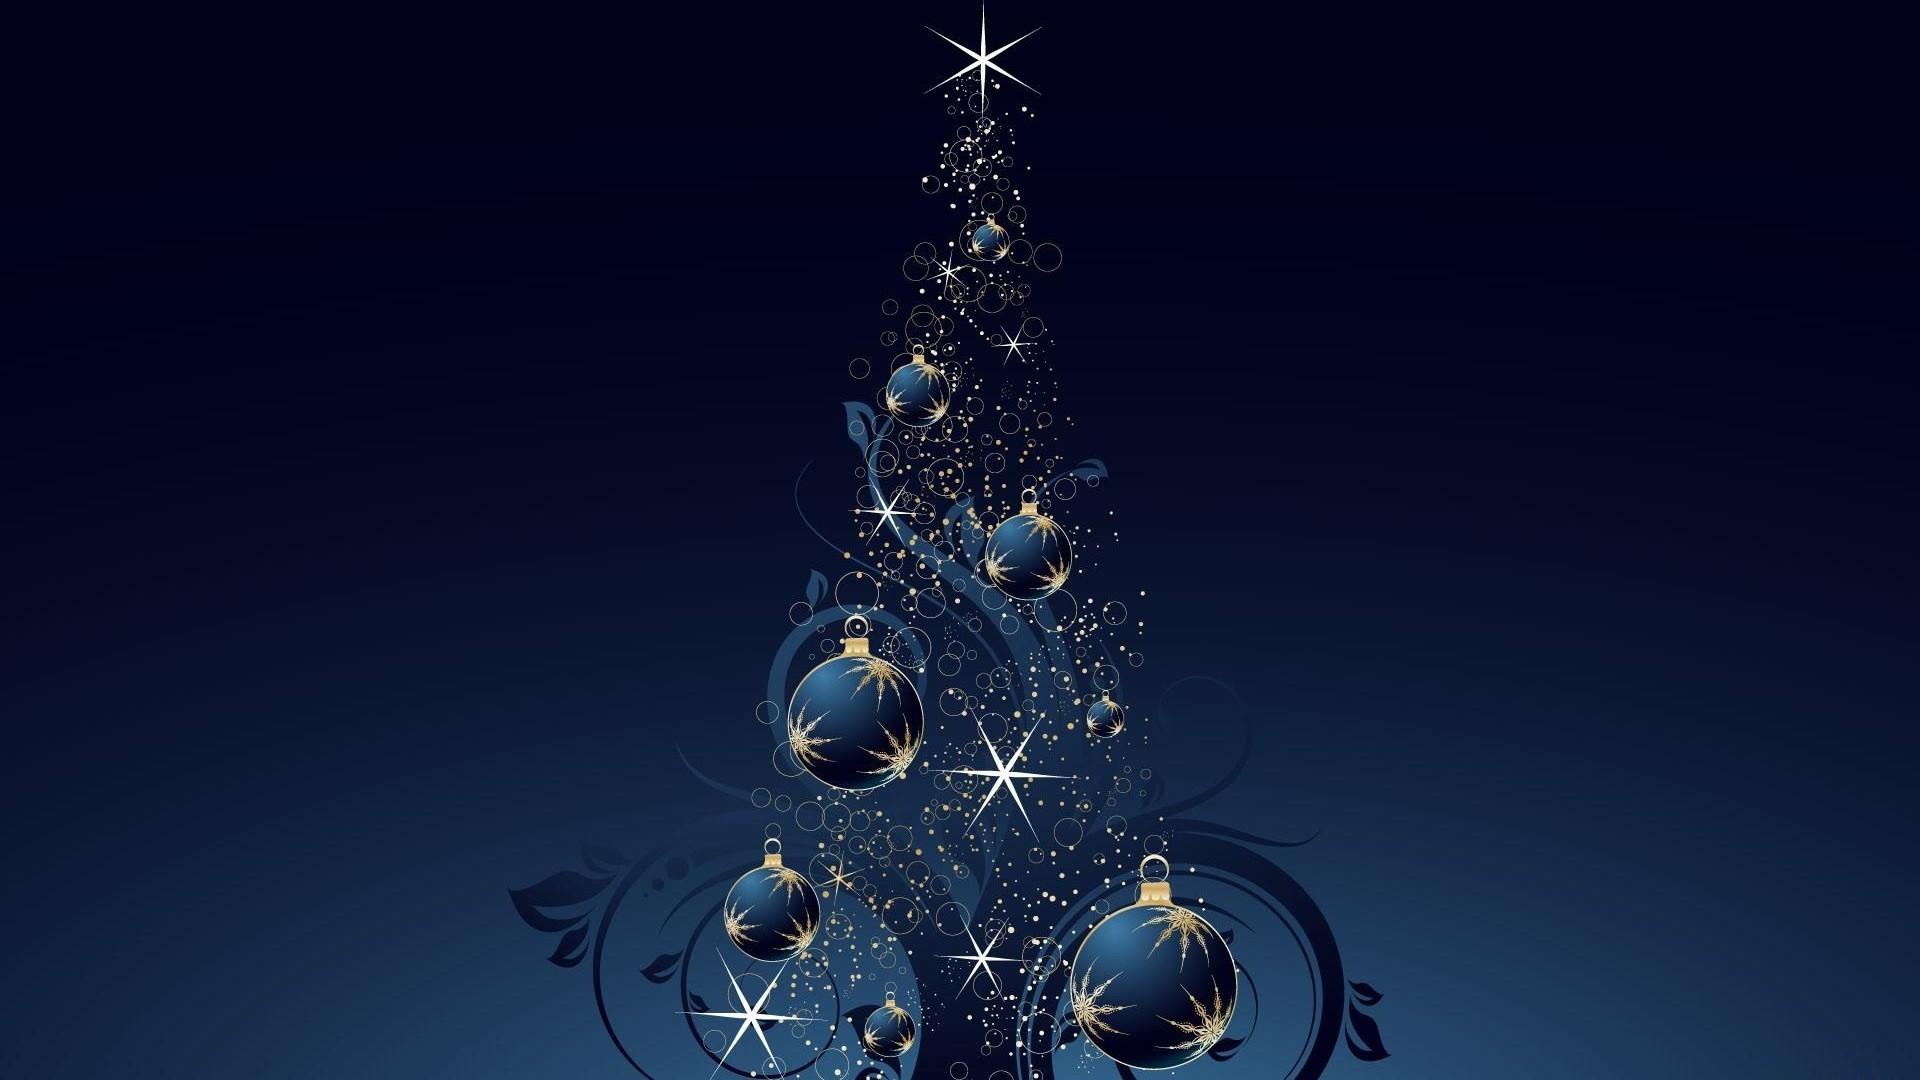 … christmas tree, star, toys